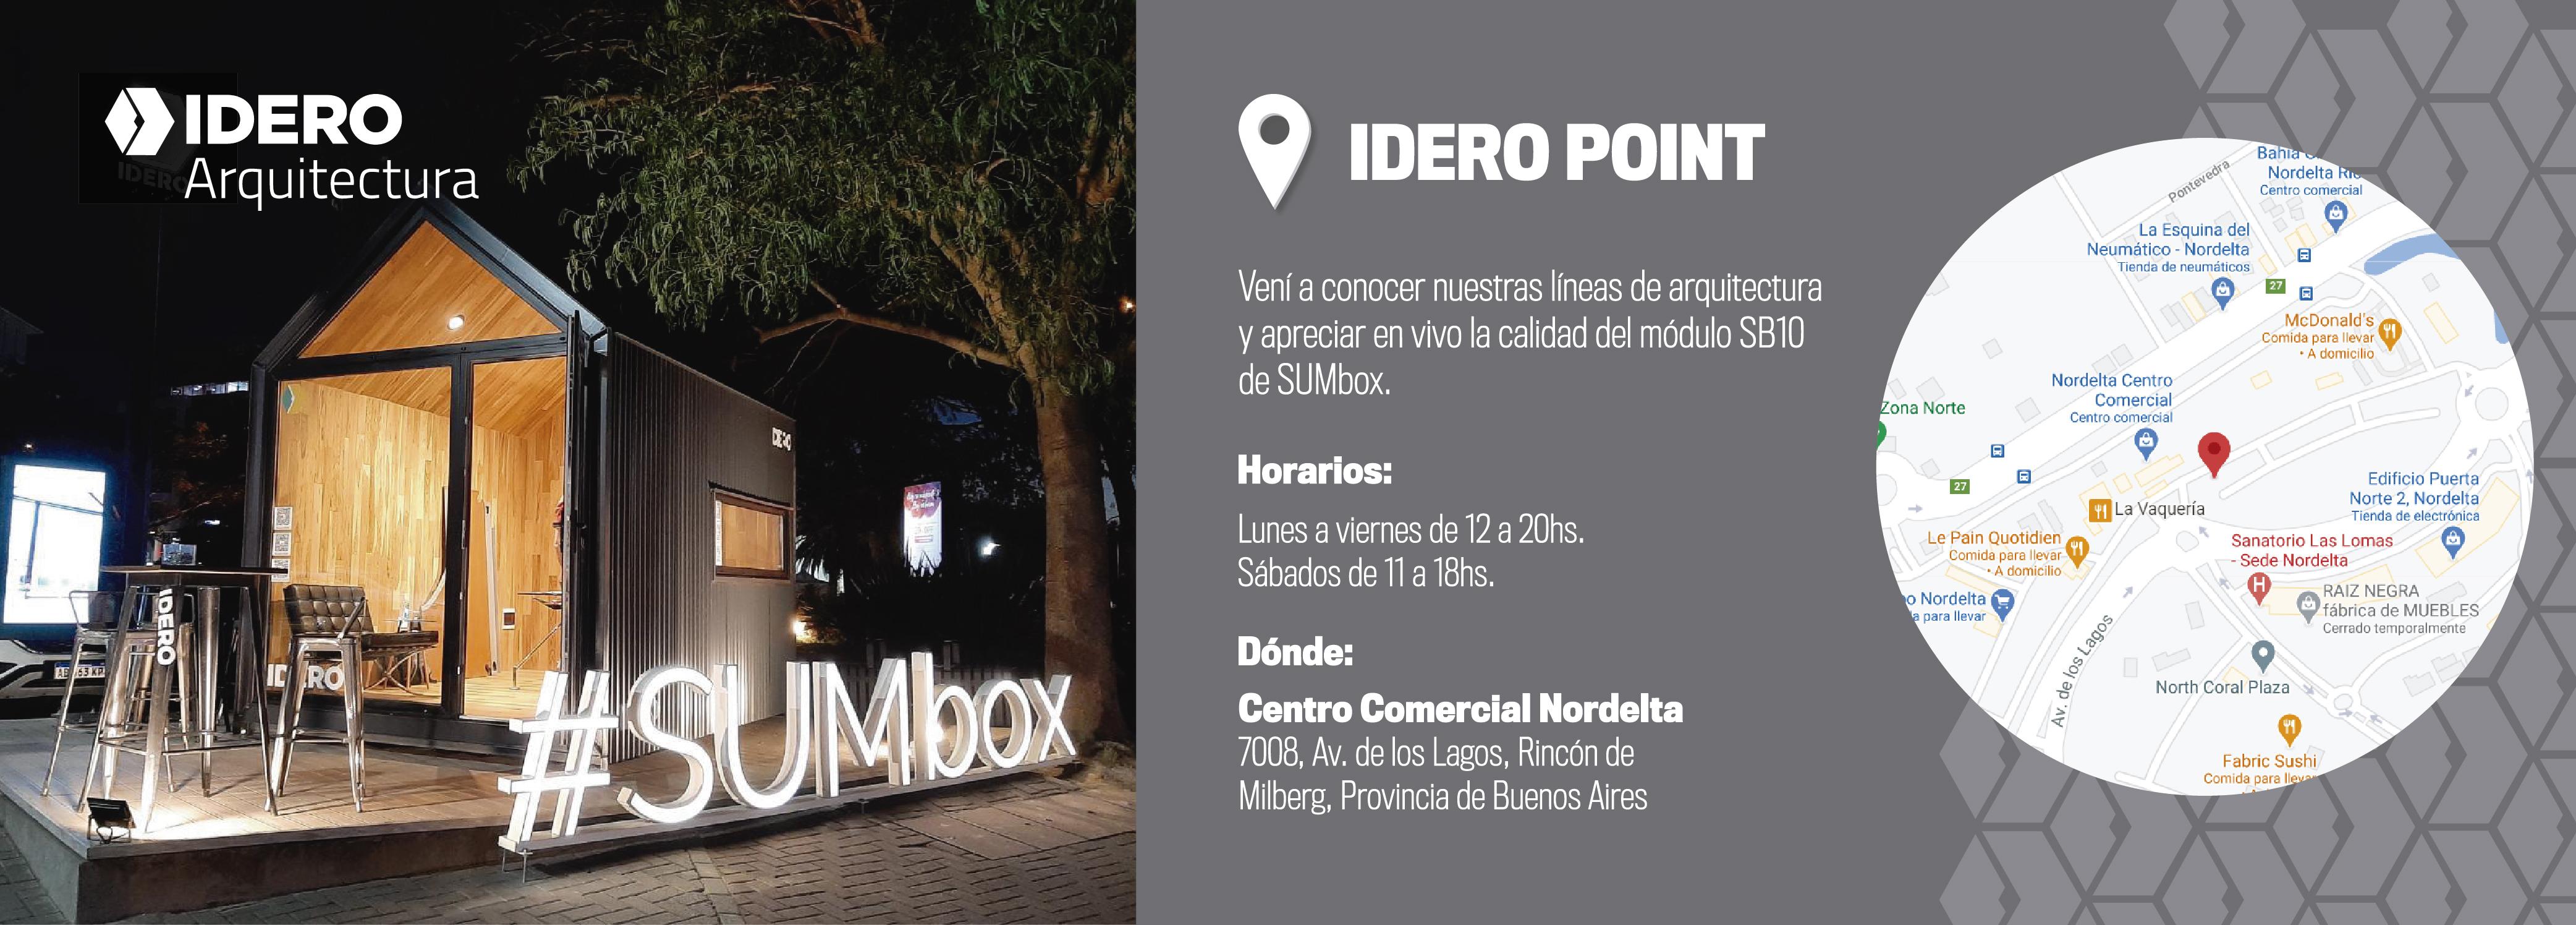 idero point